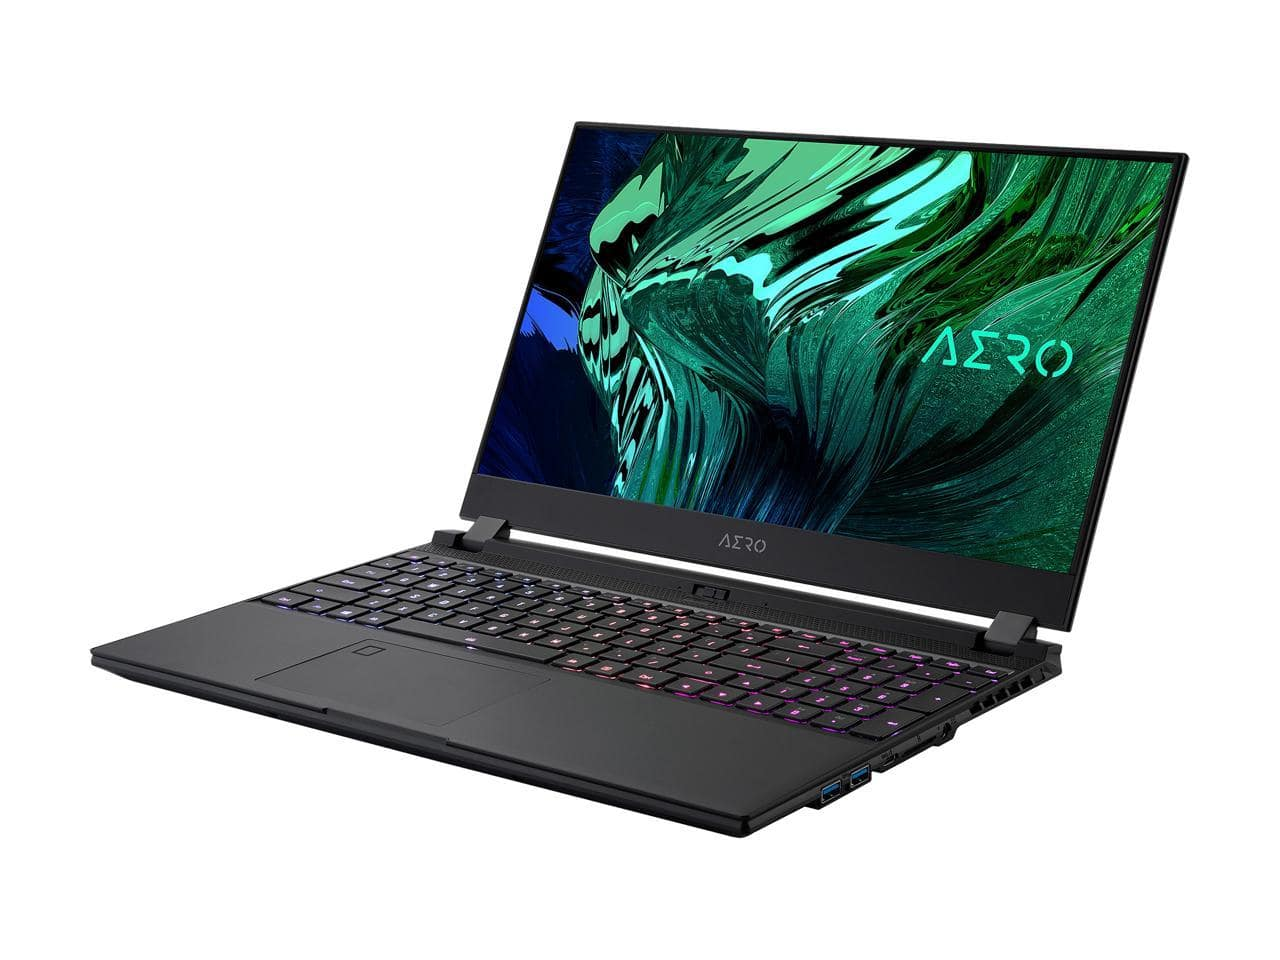 "Gigabyte Aero 15 OLED YD: 15.6"" 4K AMOLED, i7-11800H, RTX 3080, 16GB DDR4, 1TB PCIe Gen 4 SSD, Thunderbolt 4, Win10 Pro @ $1899 AR + F/S at Newegg"